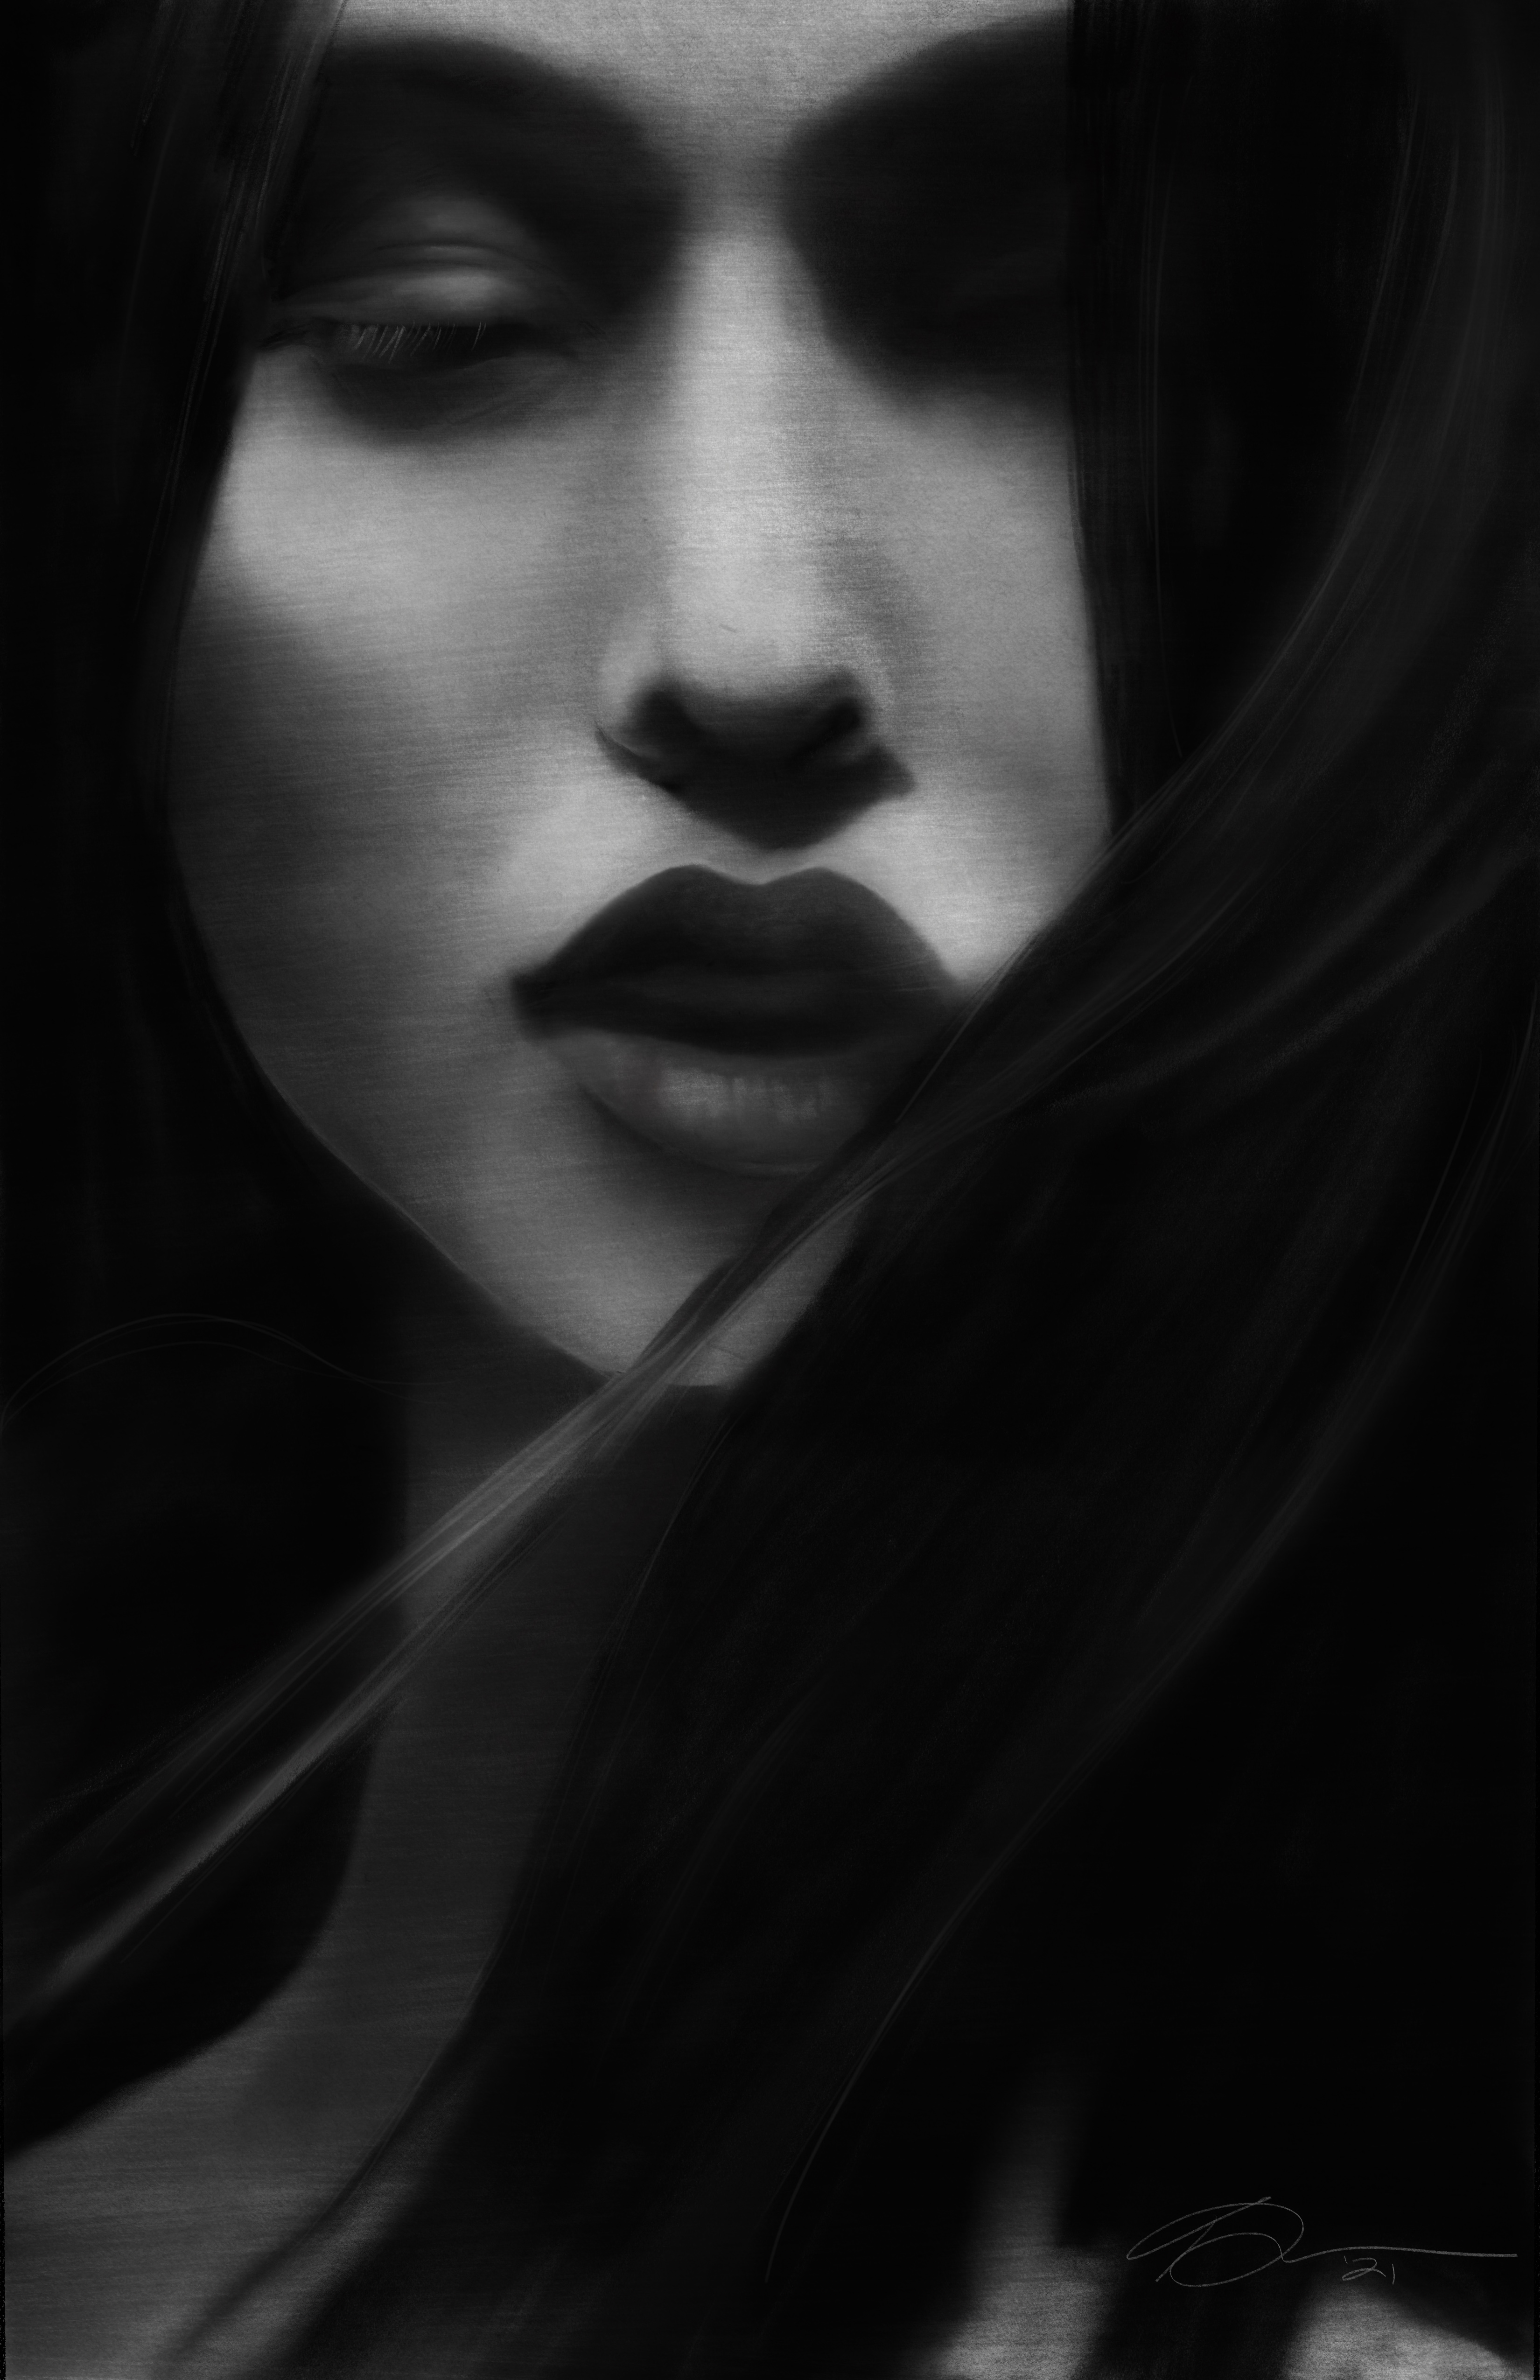 Facial Study - Girl dark atmospheric 2021